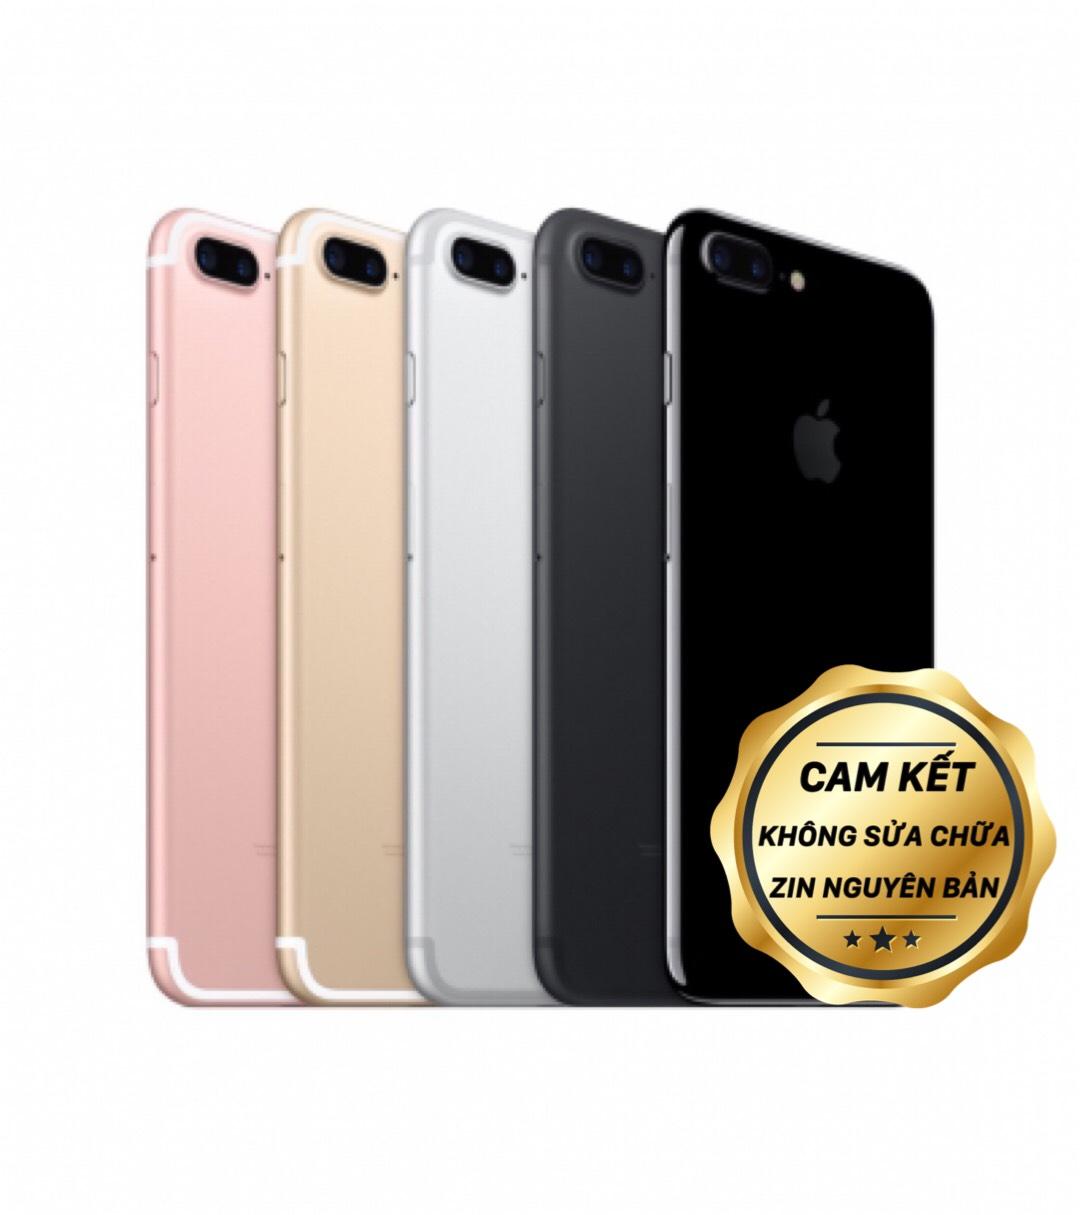 iPhone 7 Plus 32GB Đen (Giá Hời) - 4.750.000